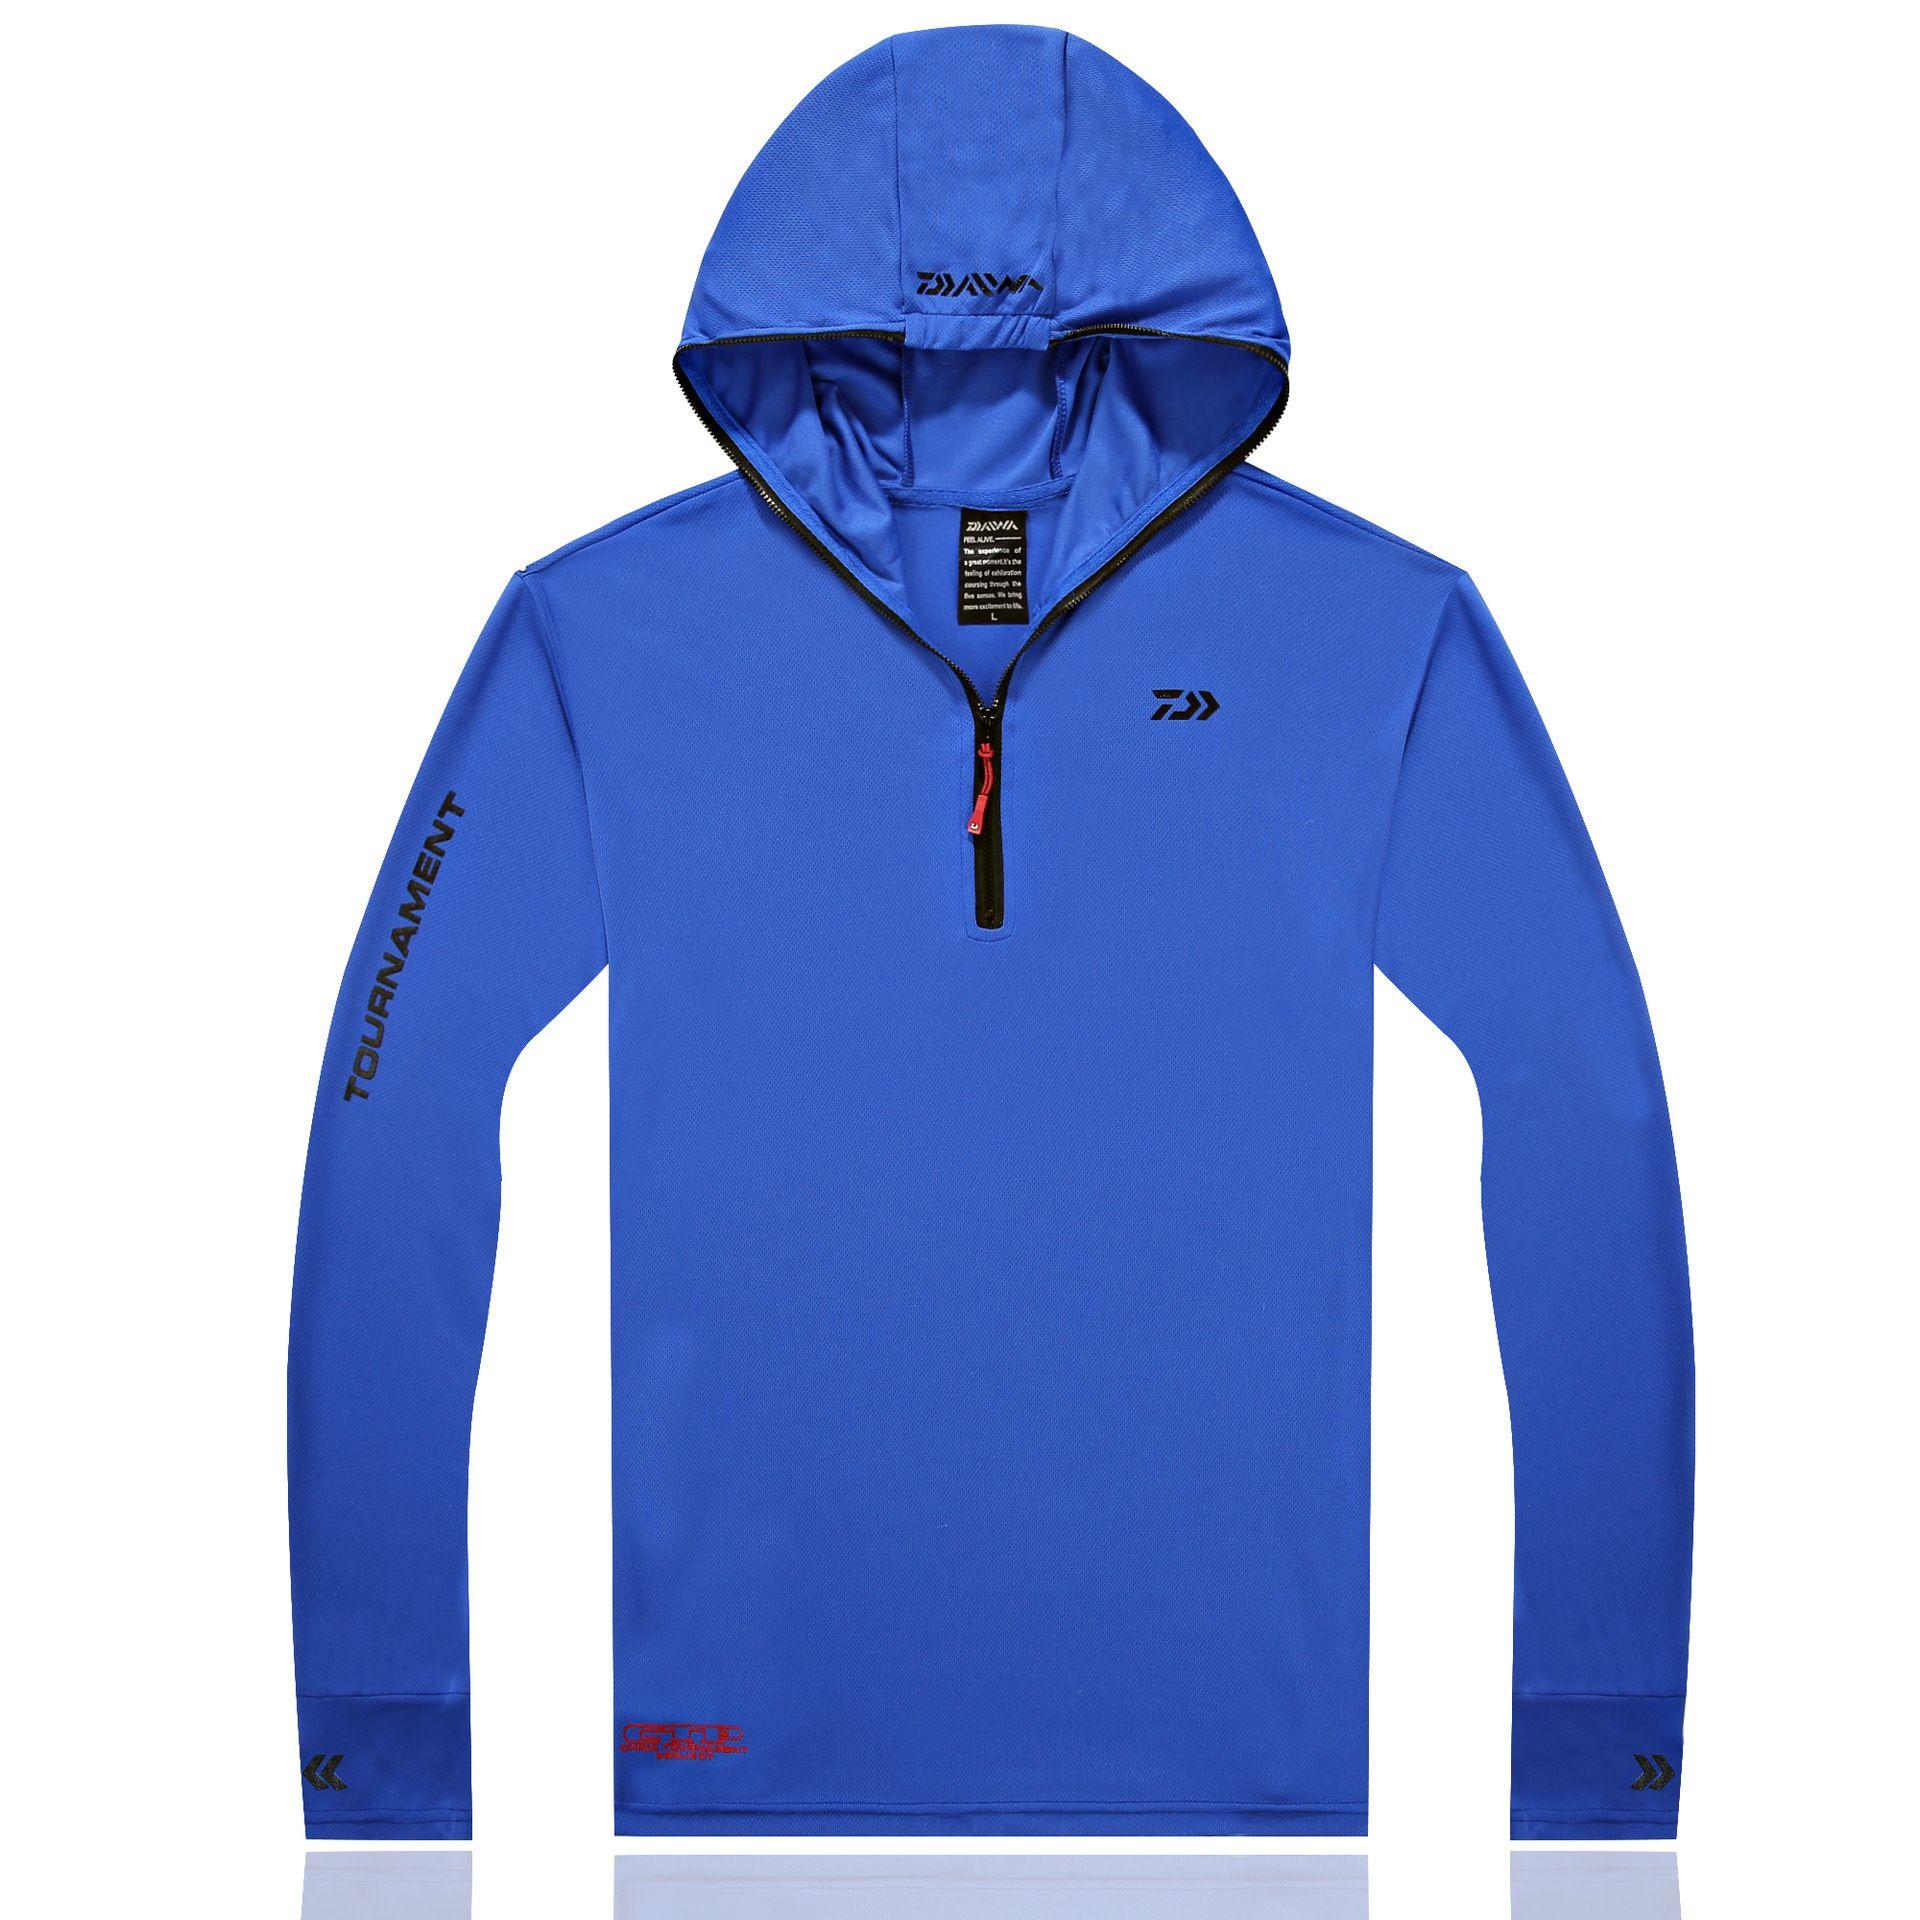 2017 Fishing Shirt  Clothing Breathable Sunscreen Shirt Men Quick Drying UPF 50+ Long Sleeve Hooded Fishing Shirts